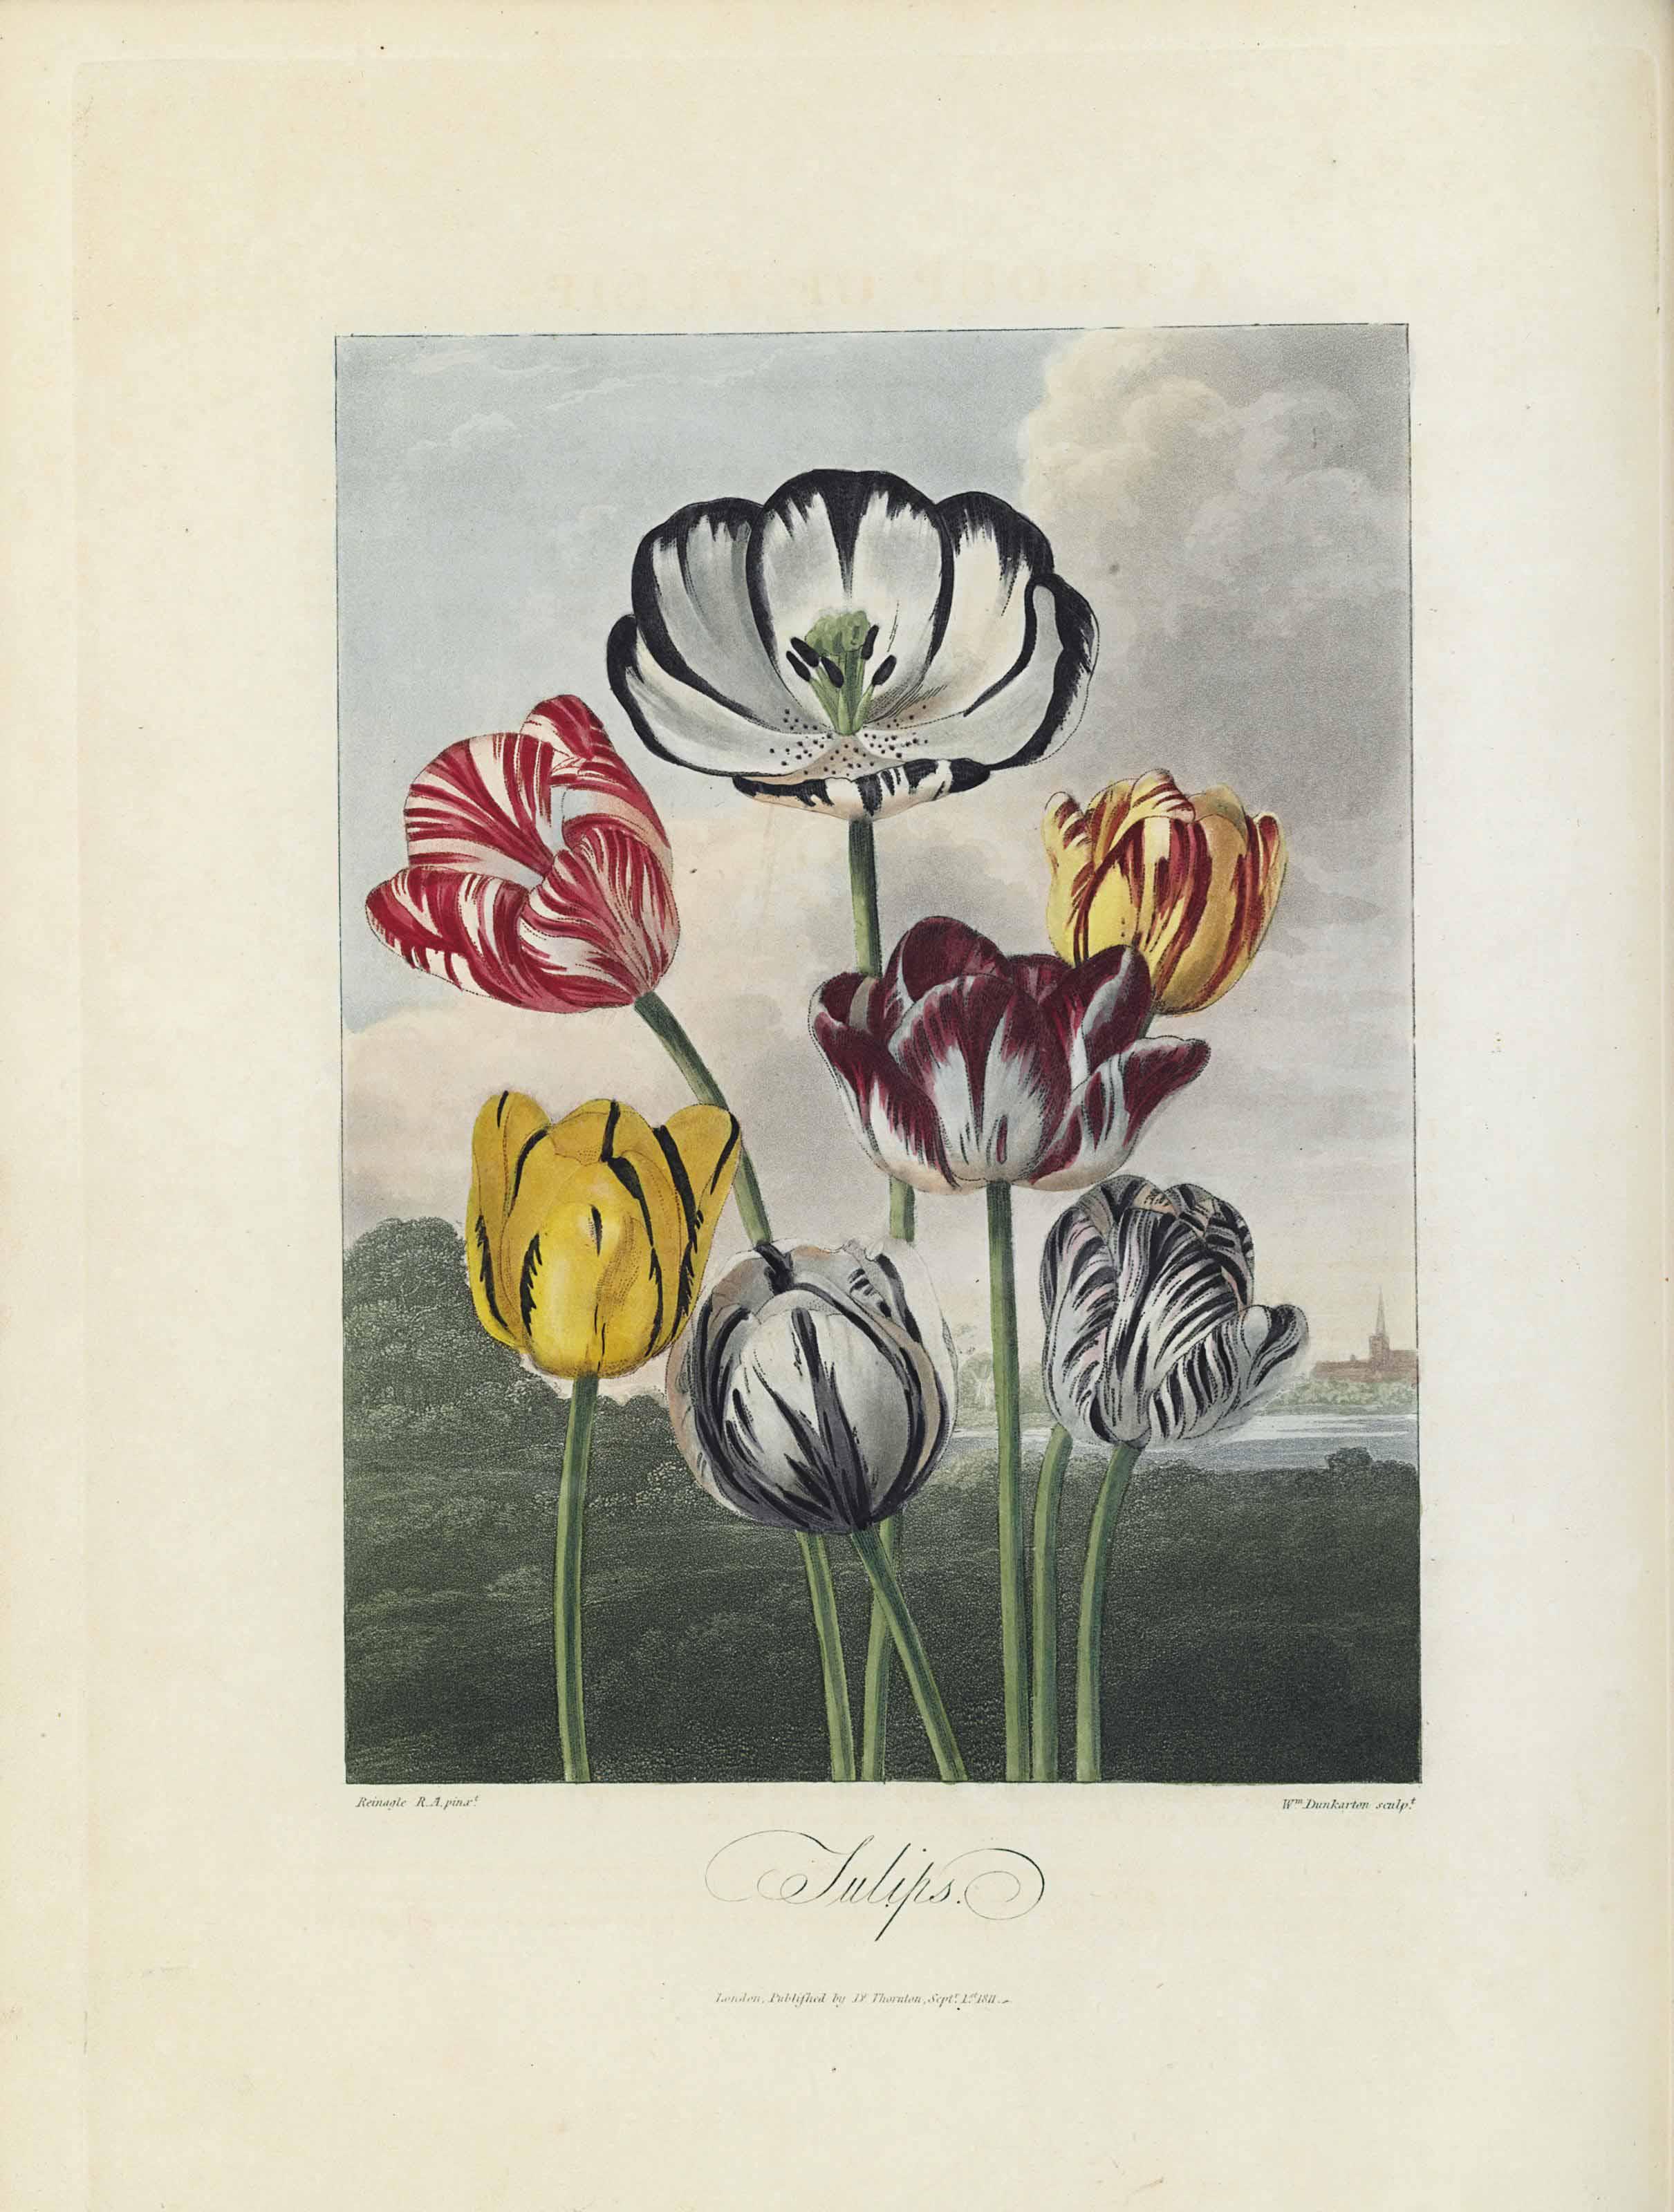 THORNTON, Robert John (ca 1768